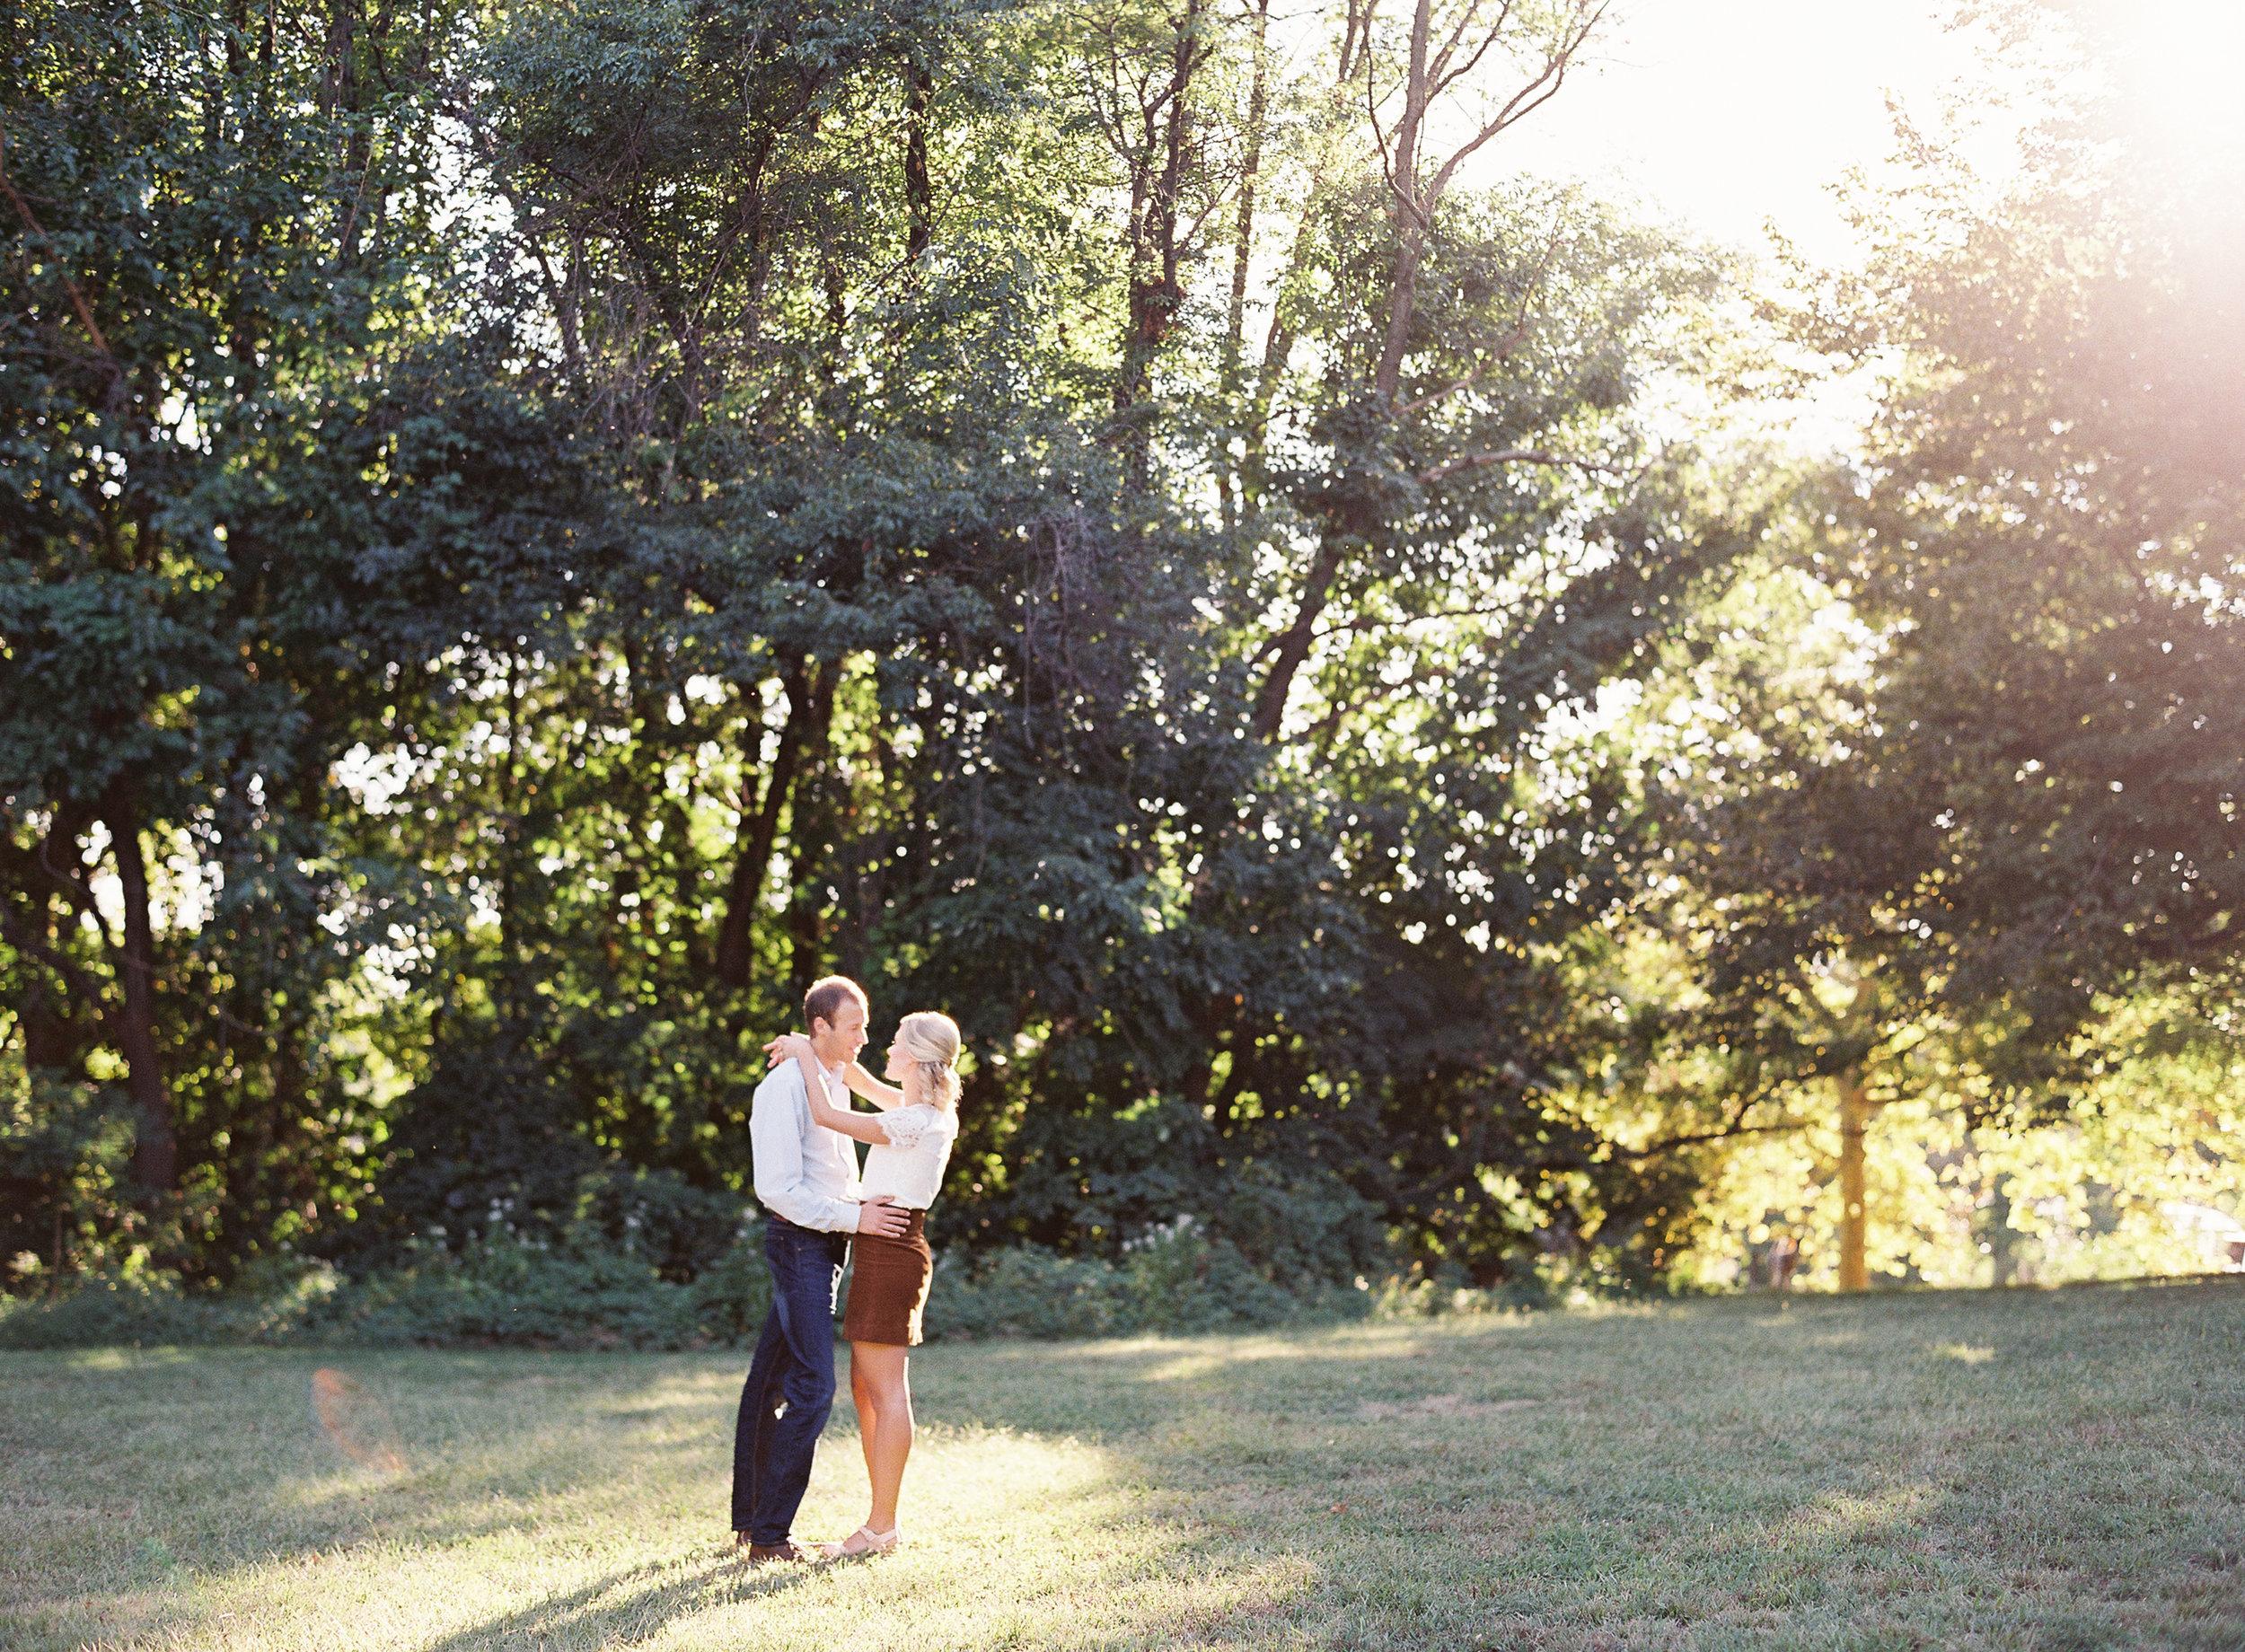 Meghan Mehan Photography | Fine Art Film Wedding Photographer | California | San Francisco | Napa | Sonoma | Santa Barbara | Big Sur | Los Angeles | Destination Wedding Photographer 022.jpg